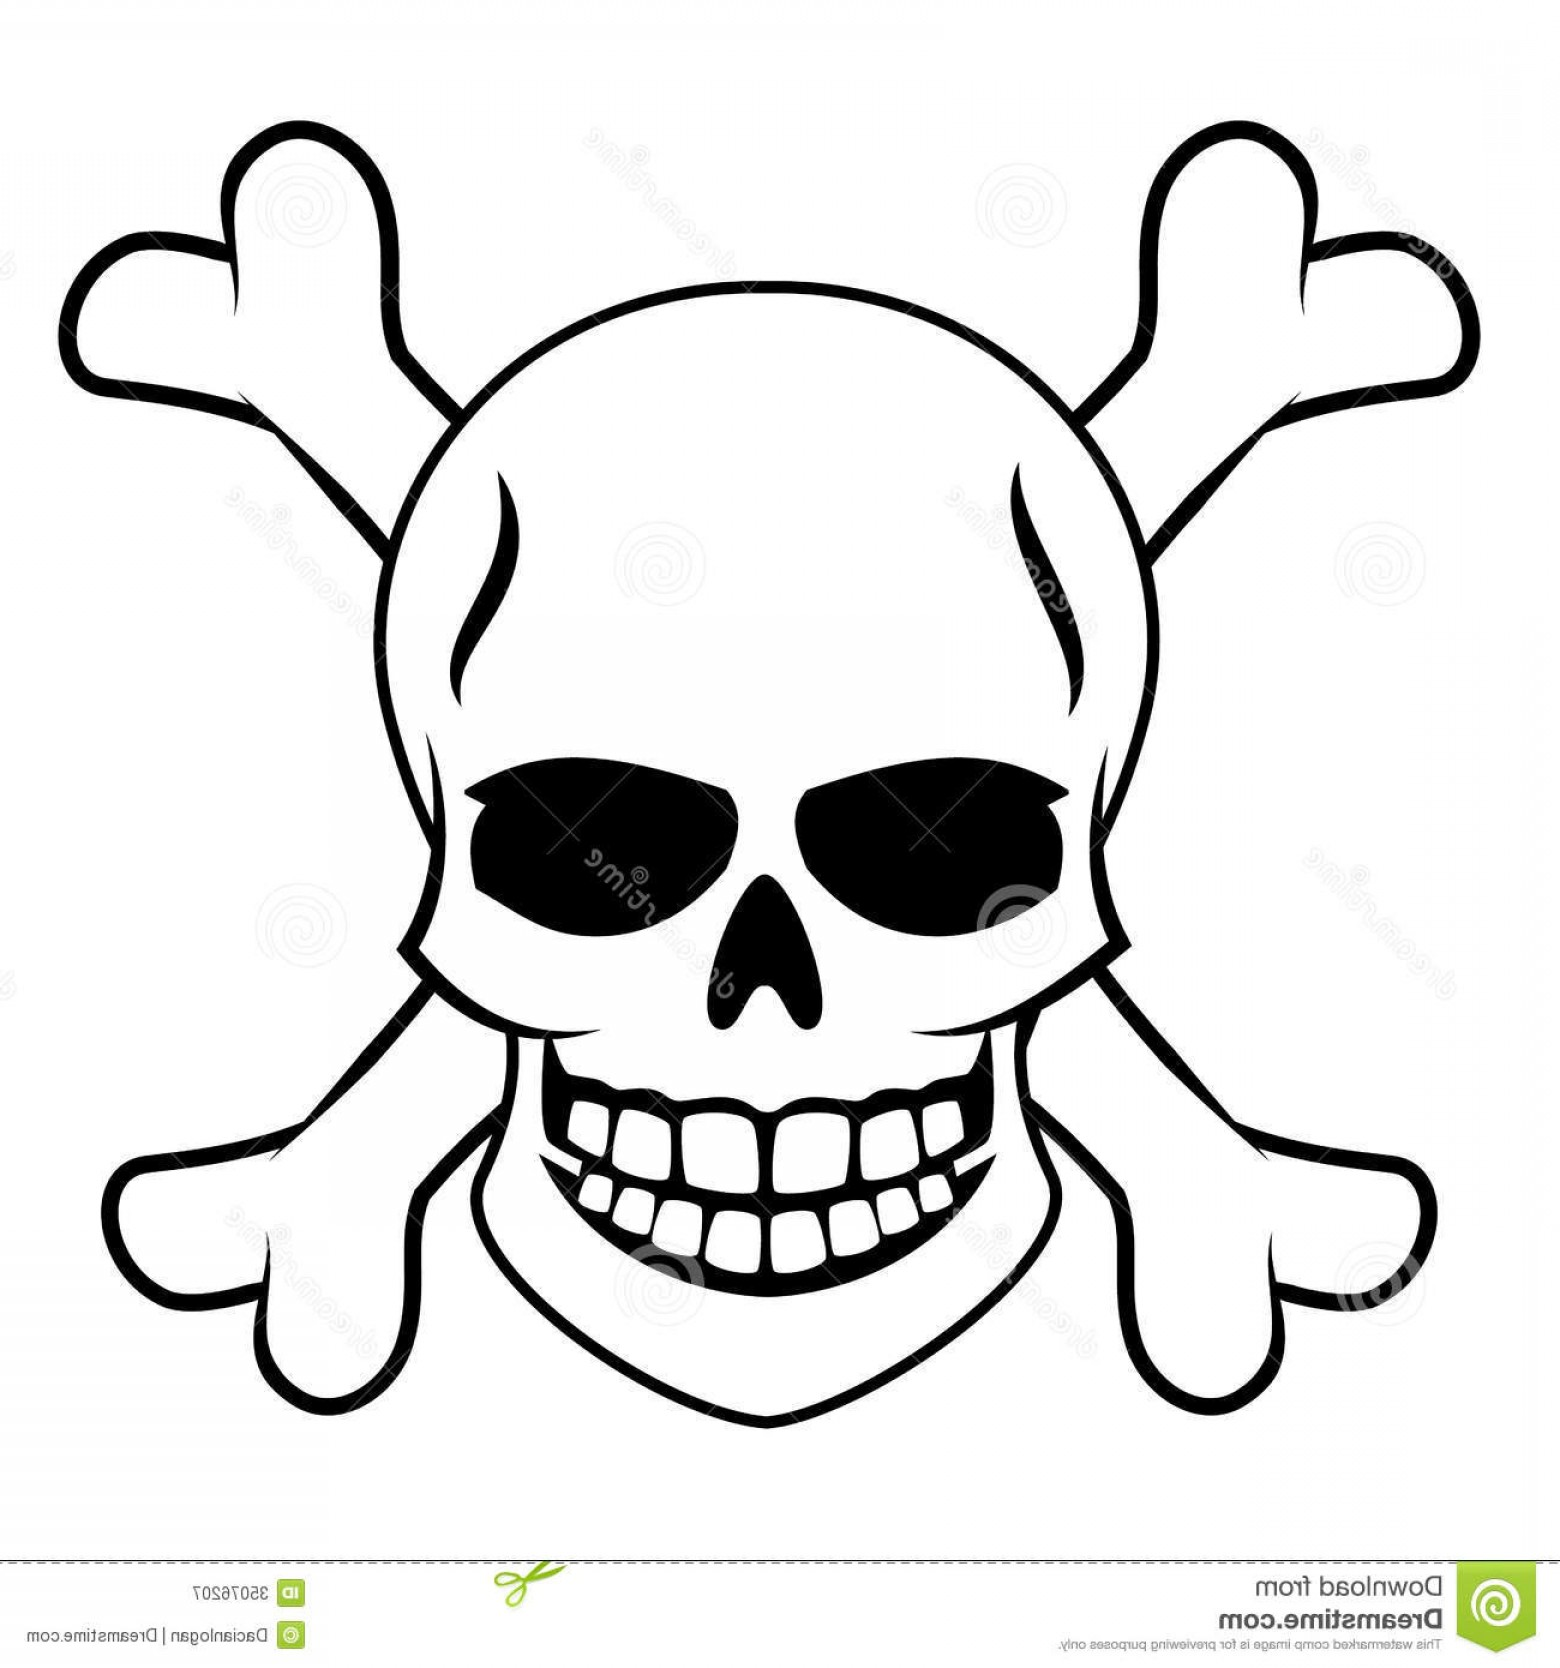 1560x1668 Royalty Free Stock Photography Skull Crossbones Vector